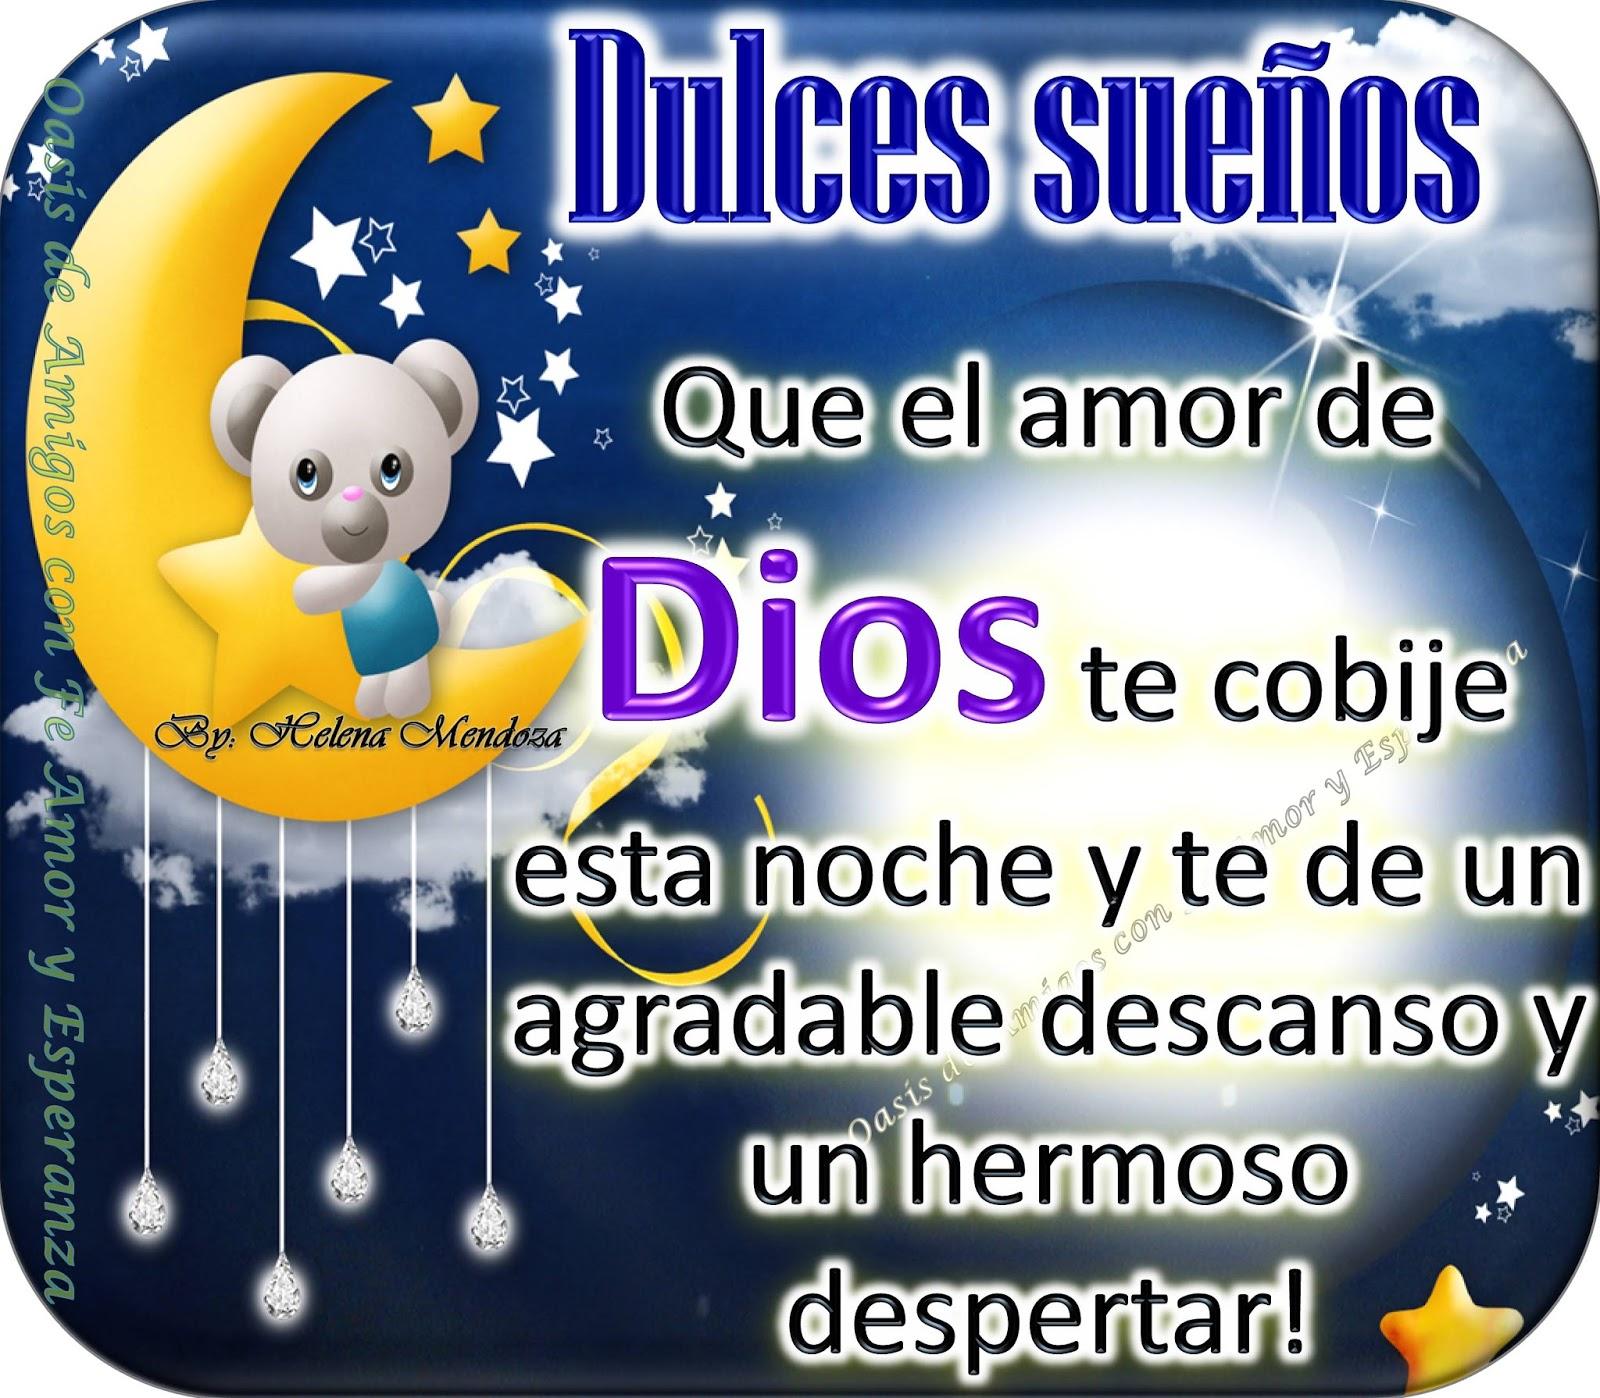 Buenas Noches Amor Mio Dios Te Bendiga 89605 Loadtve